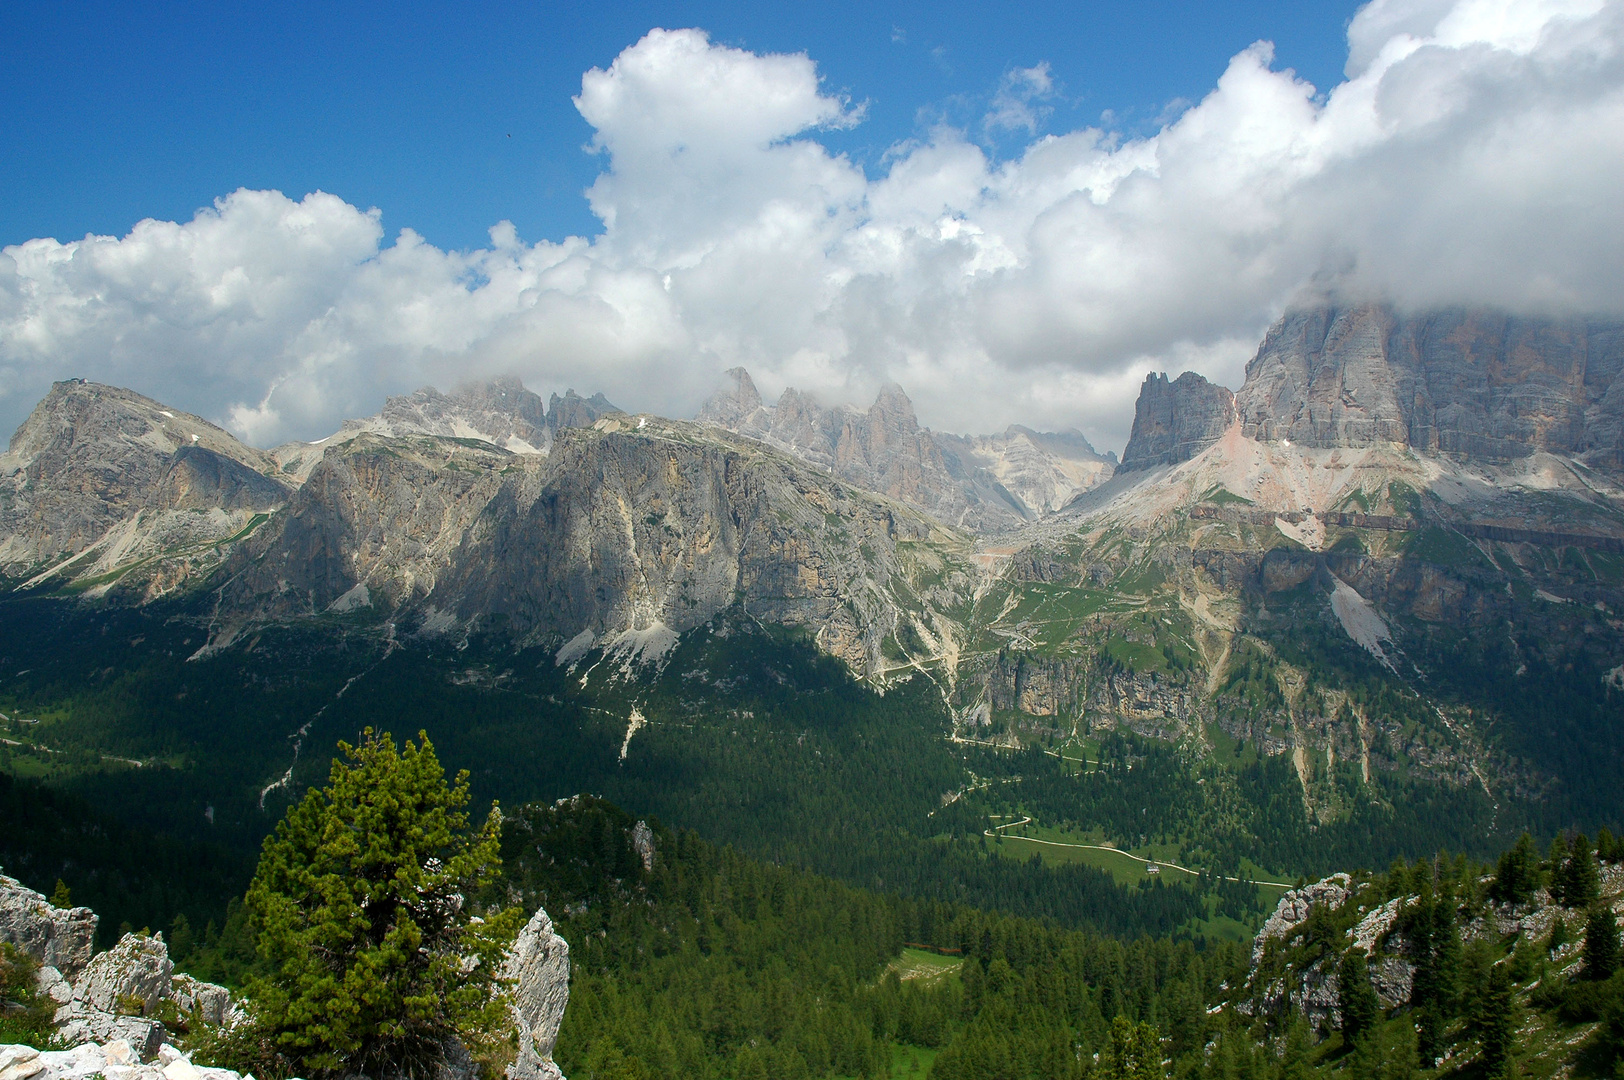 La montagne dans toute sa splendeur.